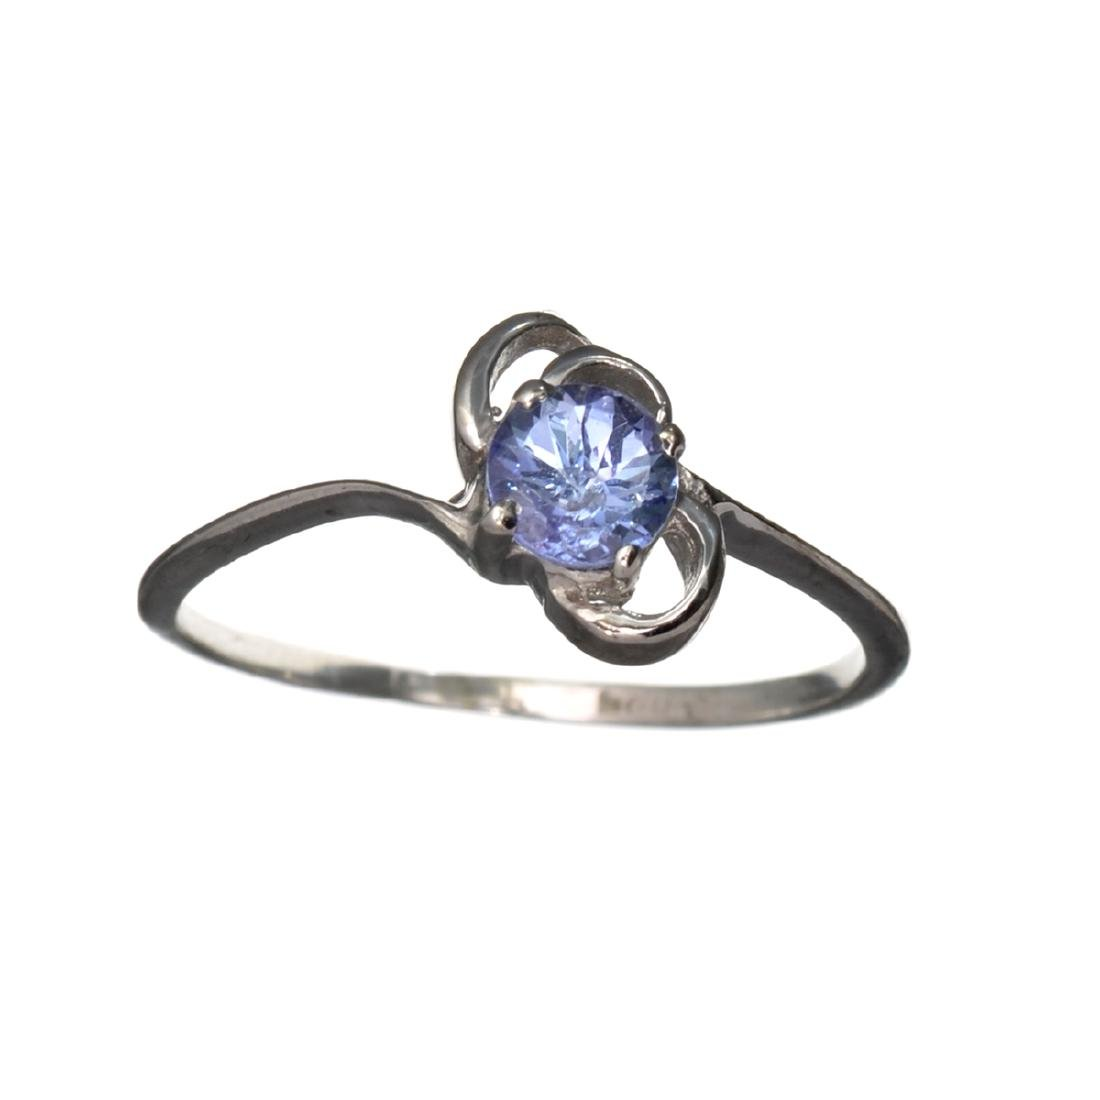 APP: 0.7k Fine Jewelry 0.31CT Round Cut Tanzanite And